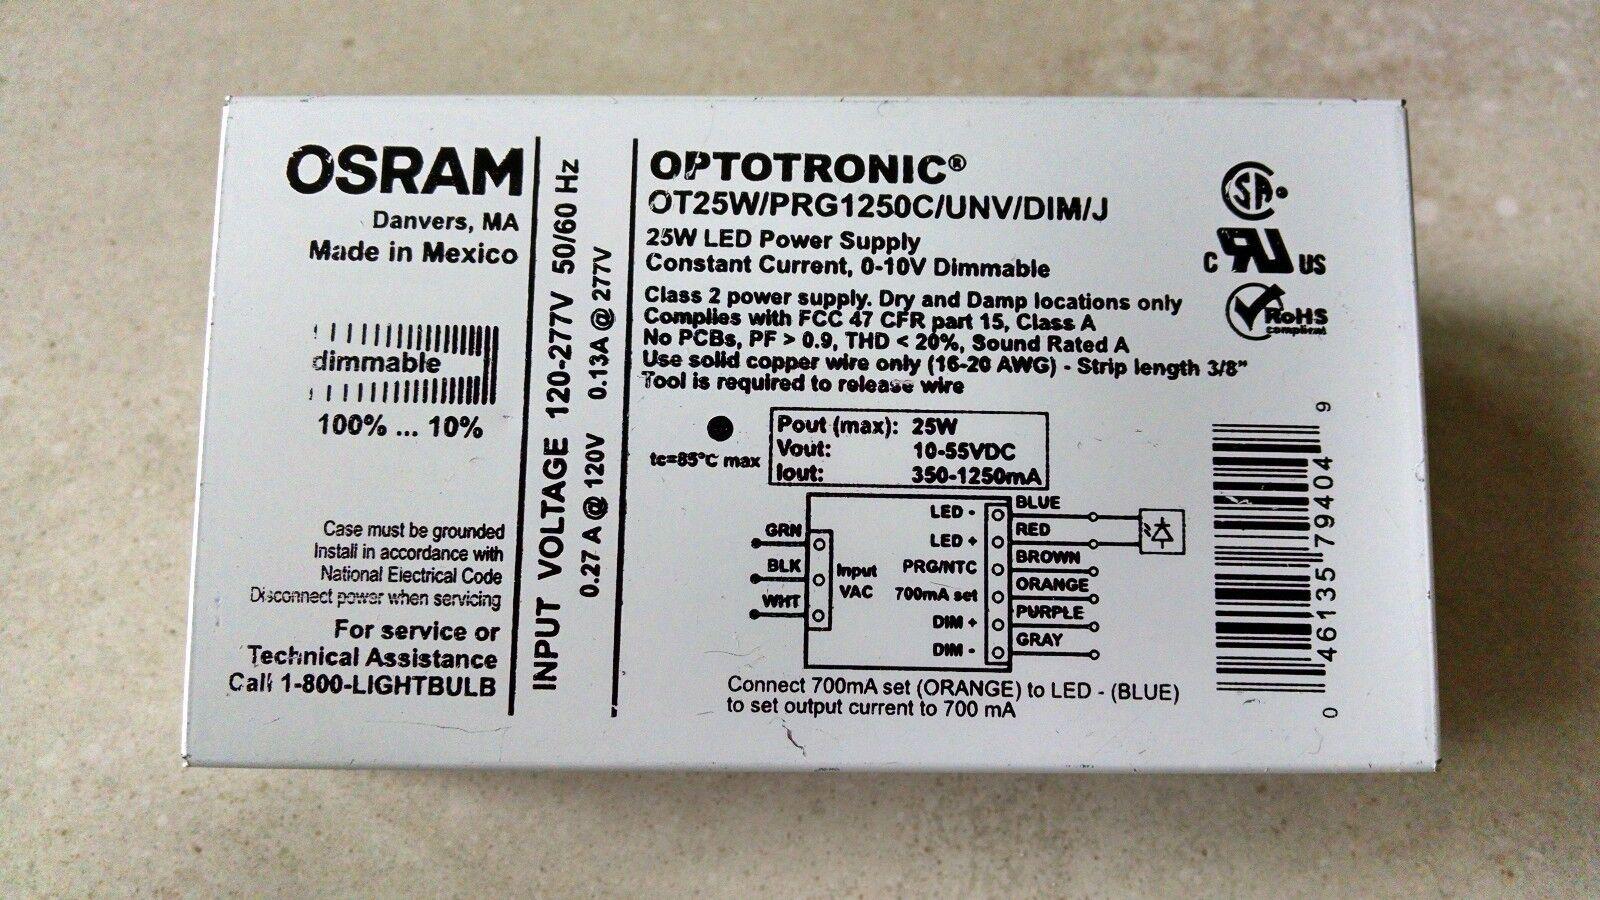 OSRAM OPTOTRONIC 25W LED POWER SUPPLY BRAND NEW OT25W//PRG1250C//UNV//DIM//J